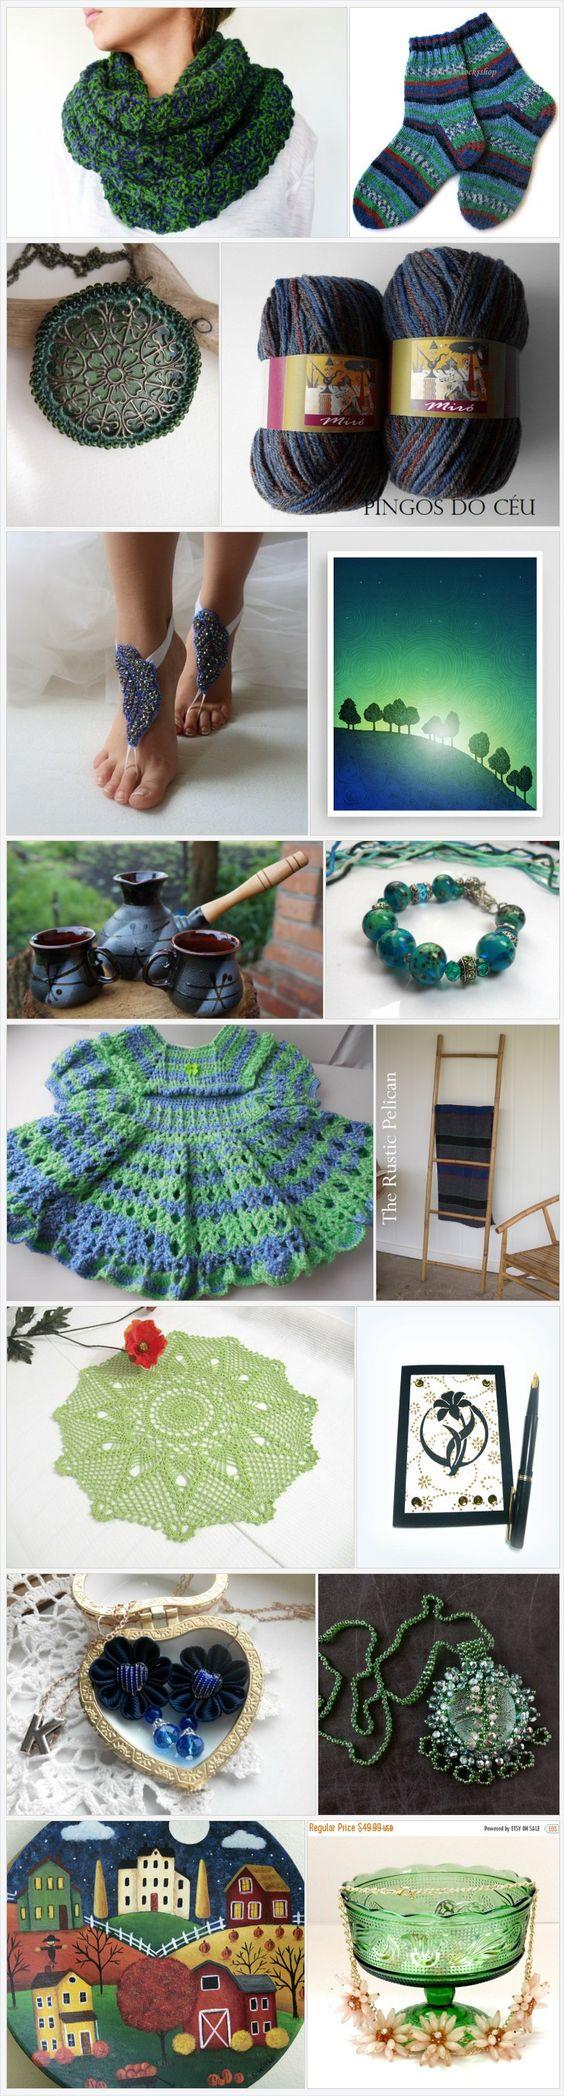 Blue & green finds! by Aleksandra on Etsy https://www.etsy.com/treasury/NjkwODYxOTZ8MjcyODQ2MDA0Ng/blue-green-finds